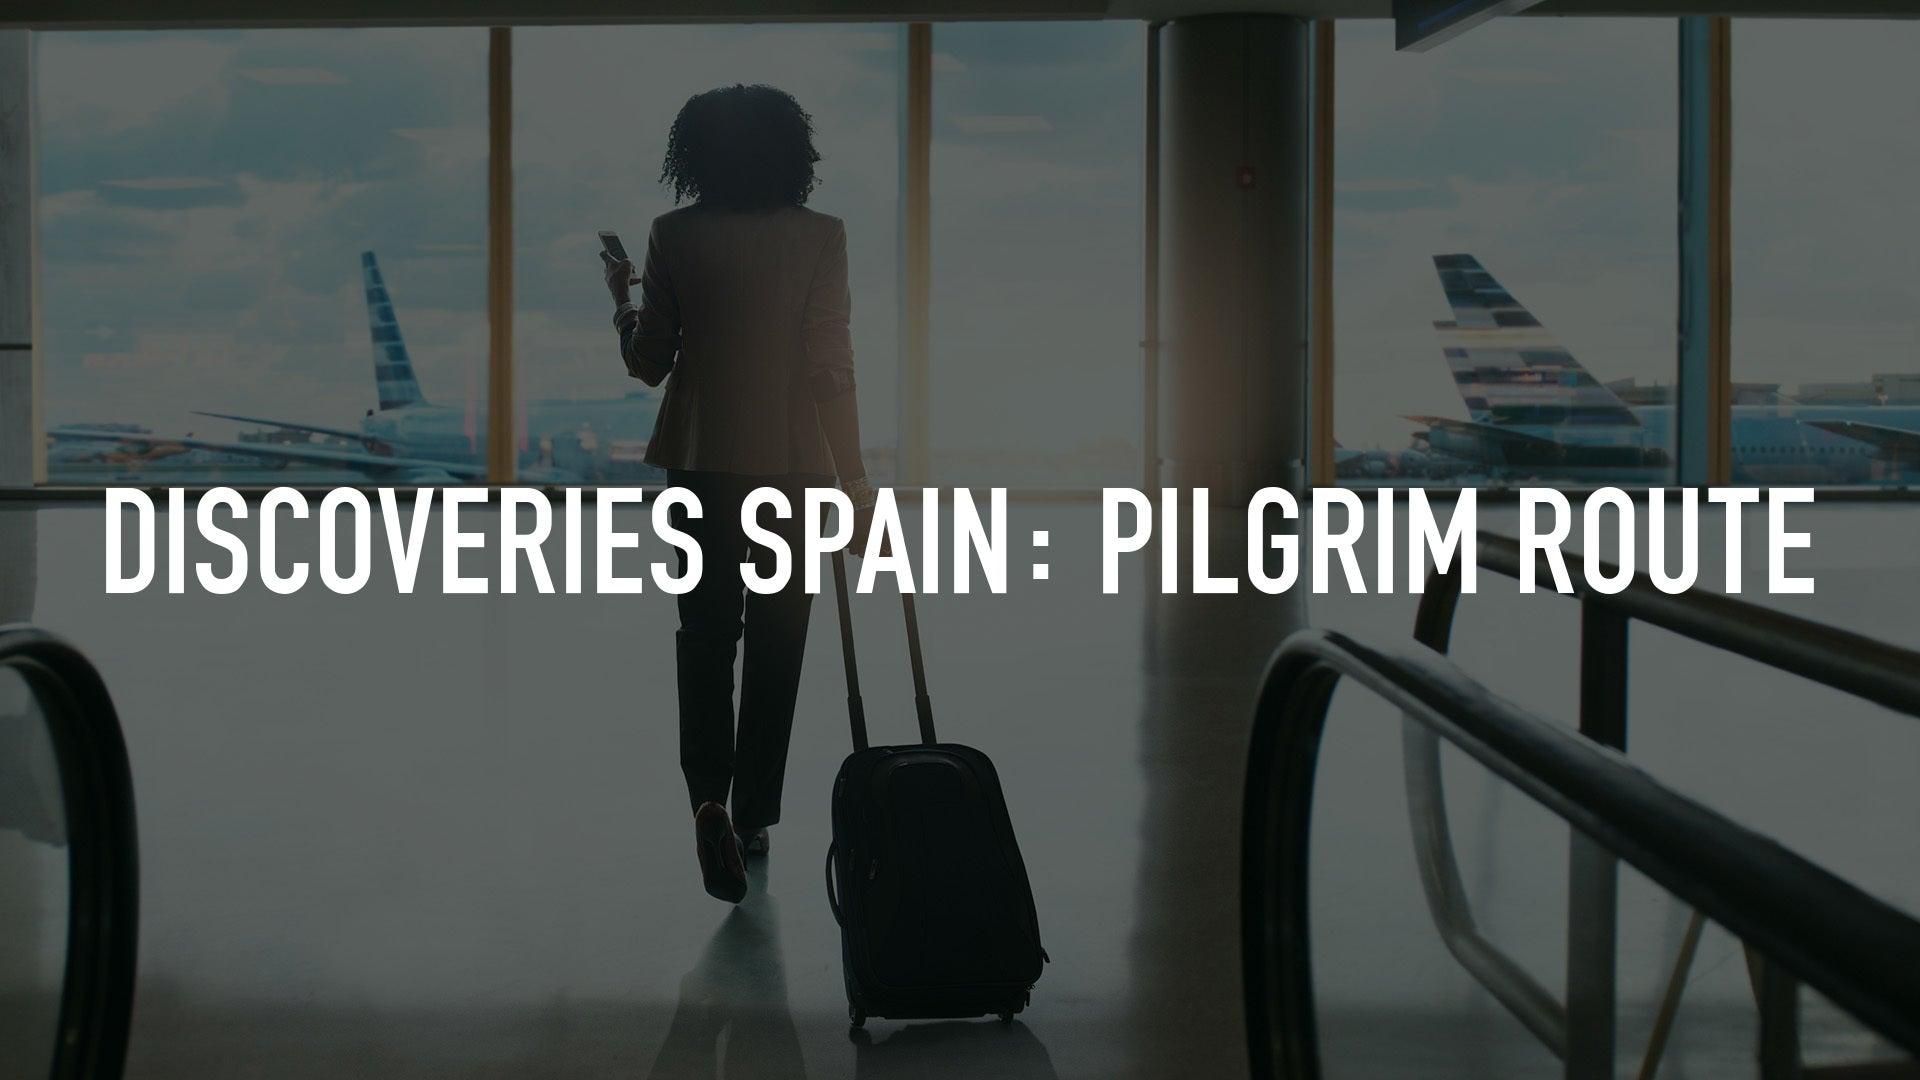 Discoveries Spain: Pilgrim Route